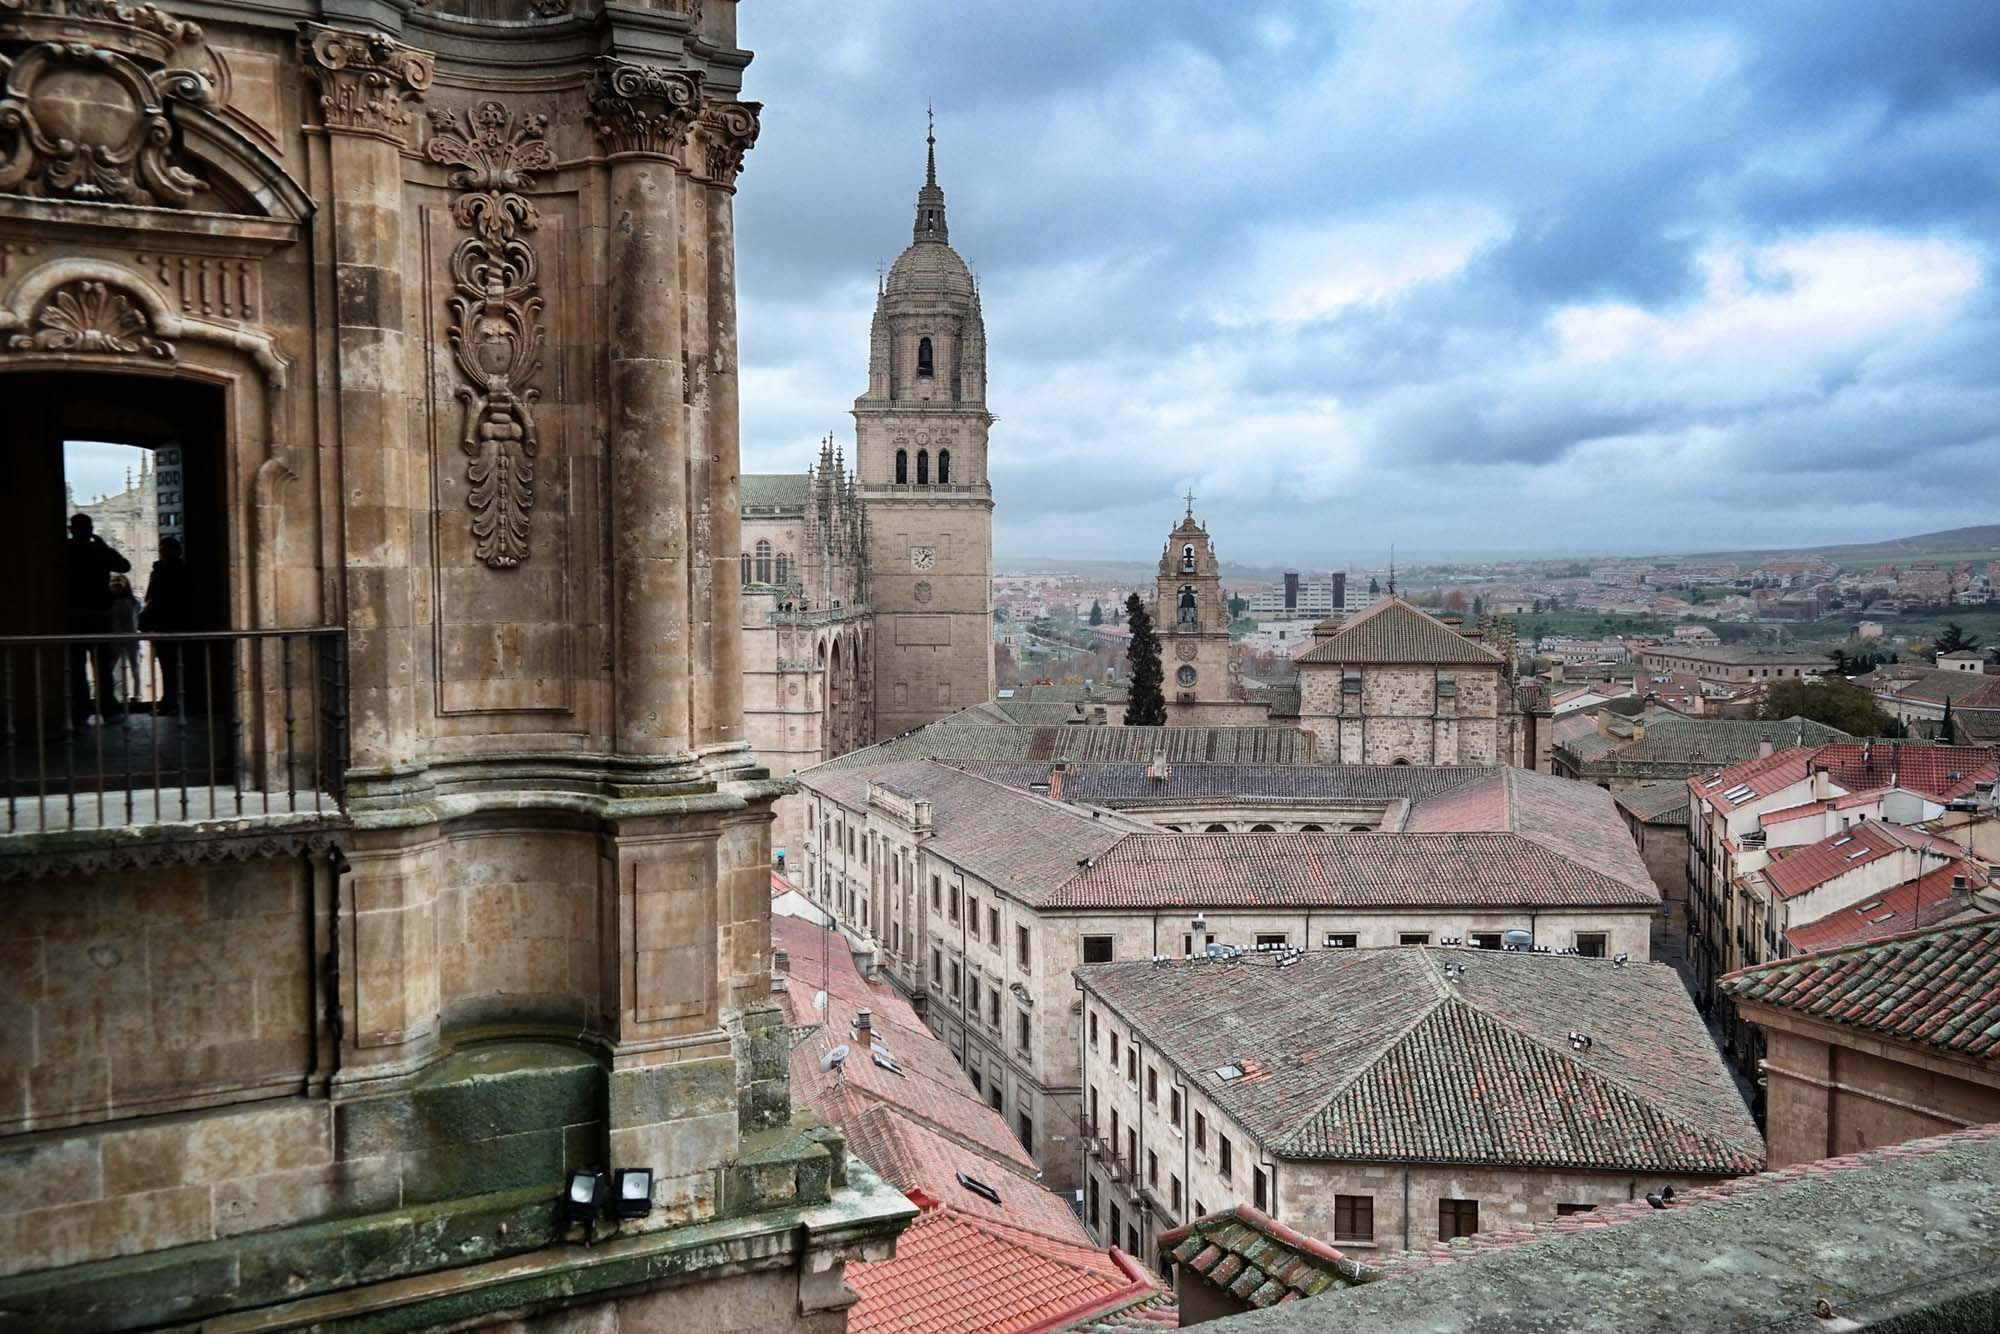 Salamanca, view from clocktower